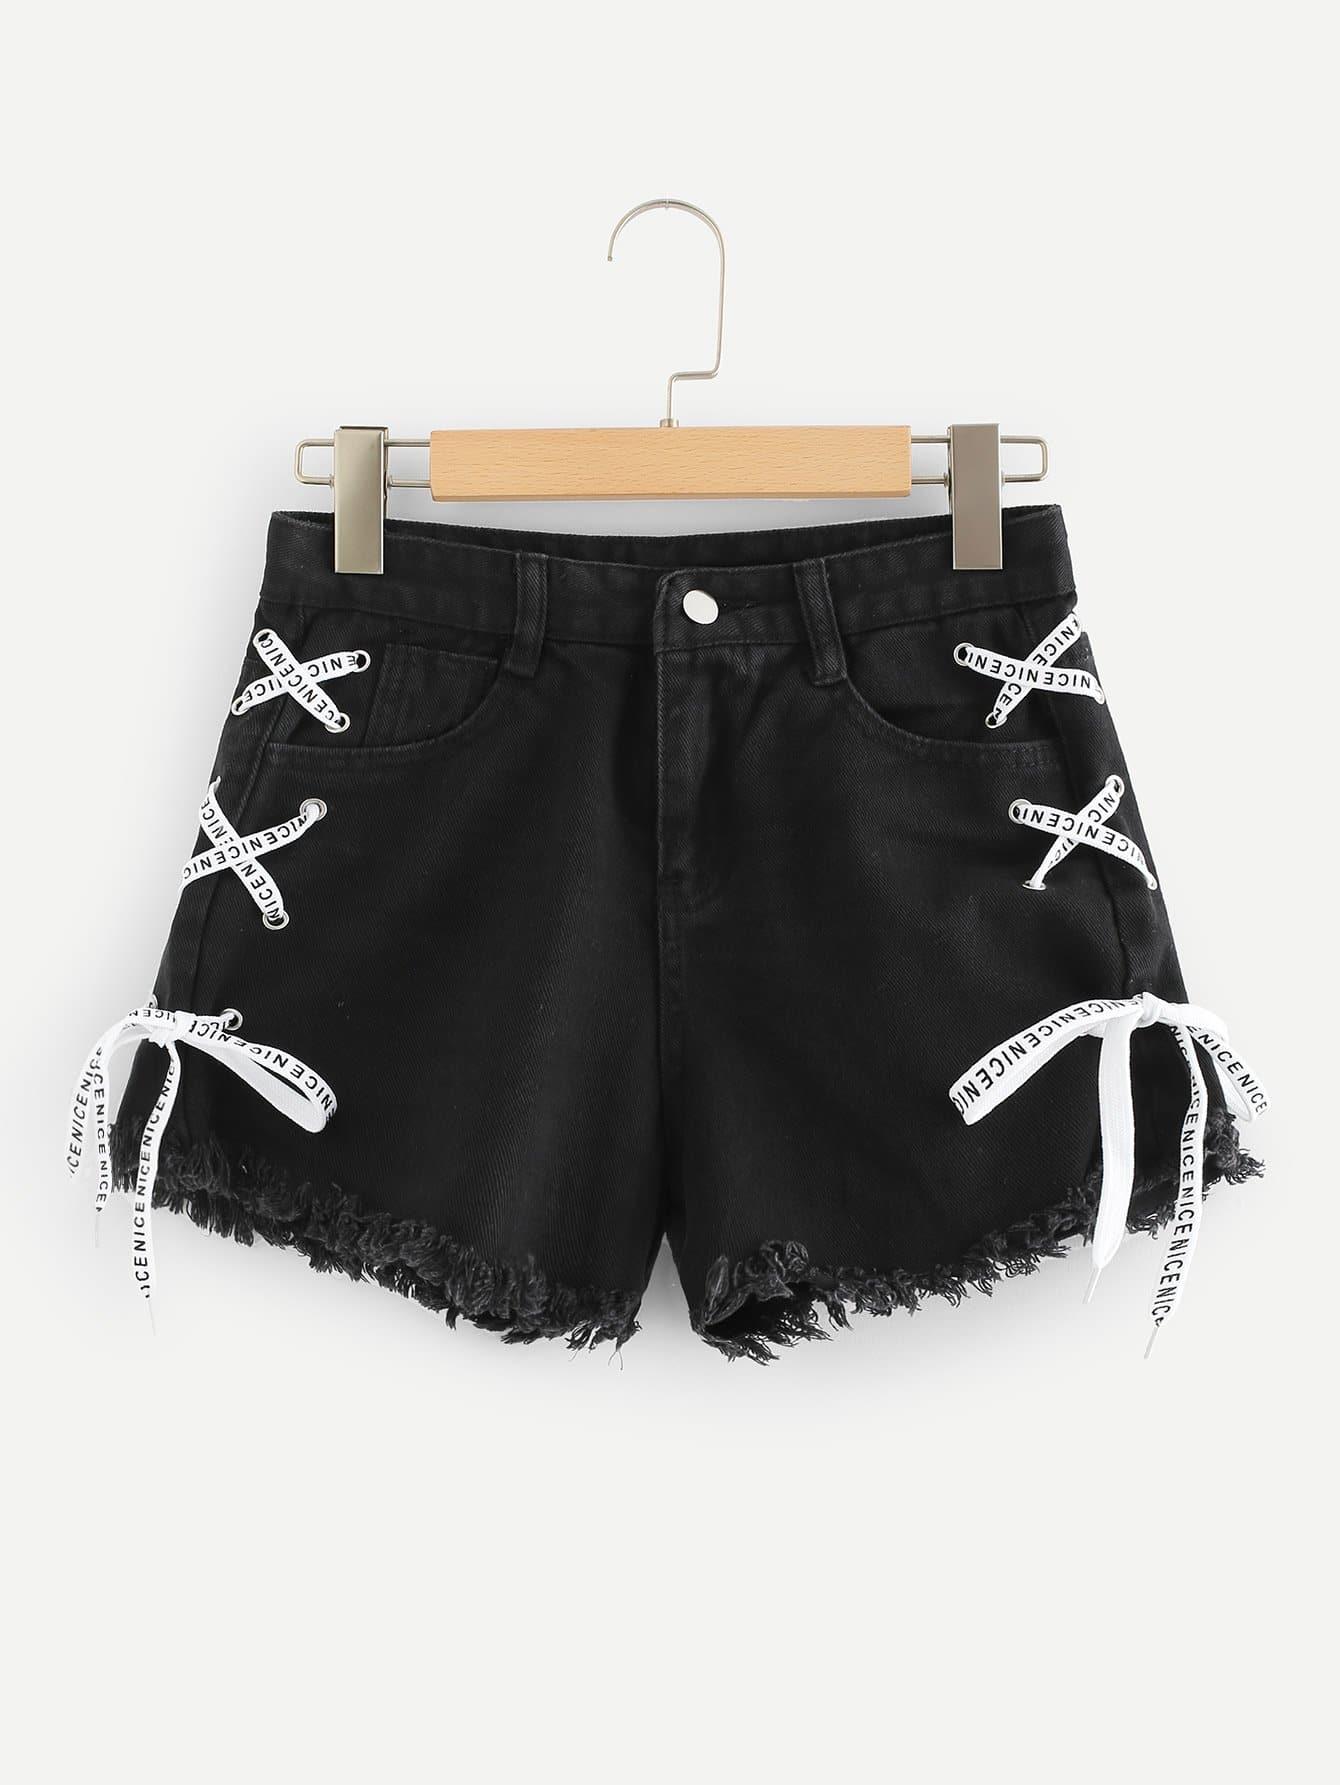 Frayed Hem Lace Up Side Denim Shorts lace hem shorts